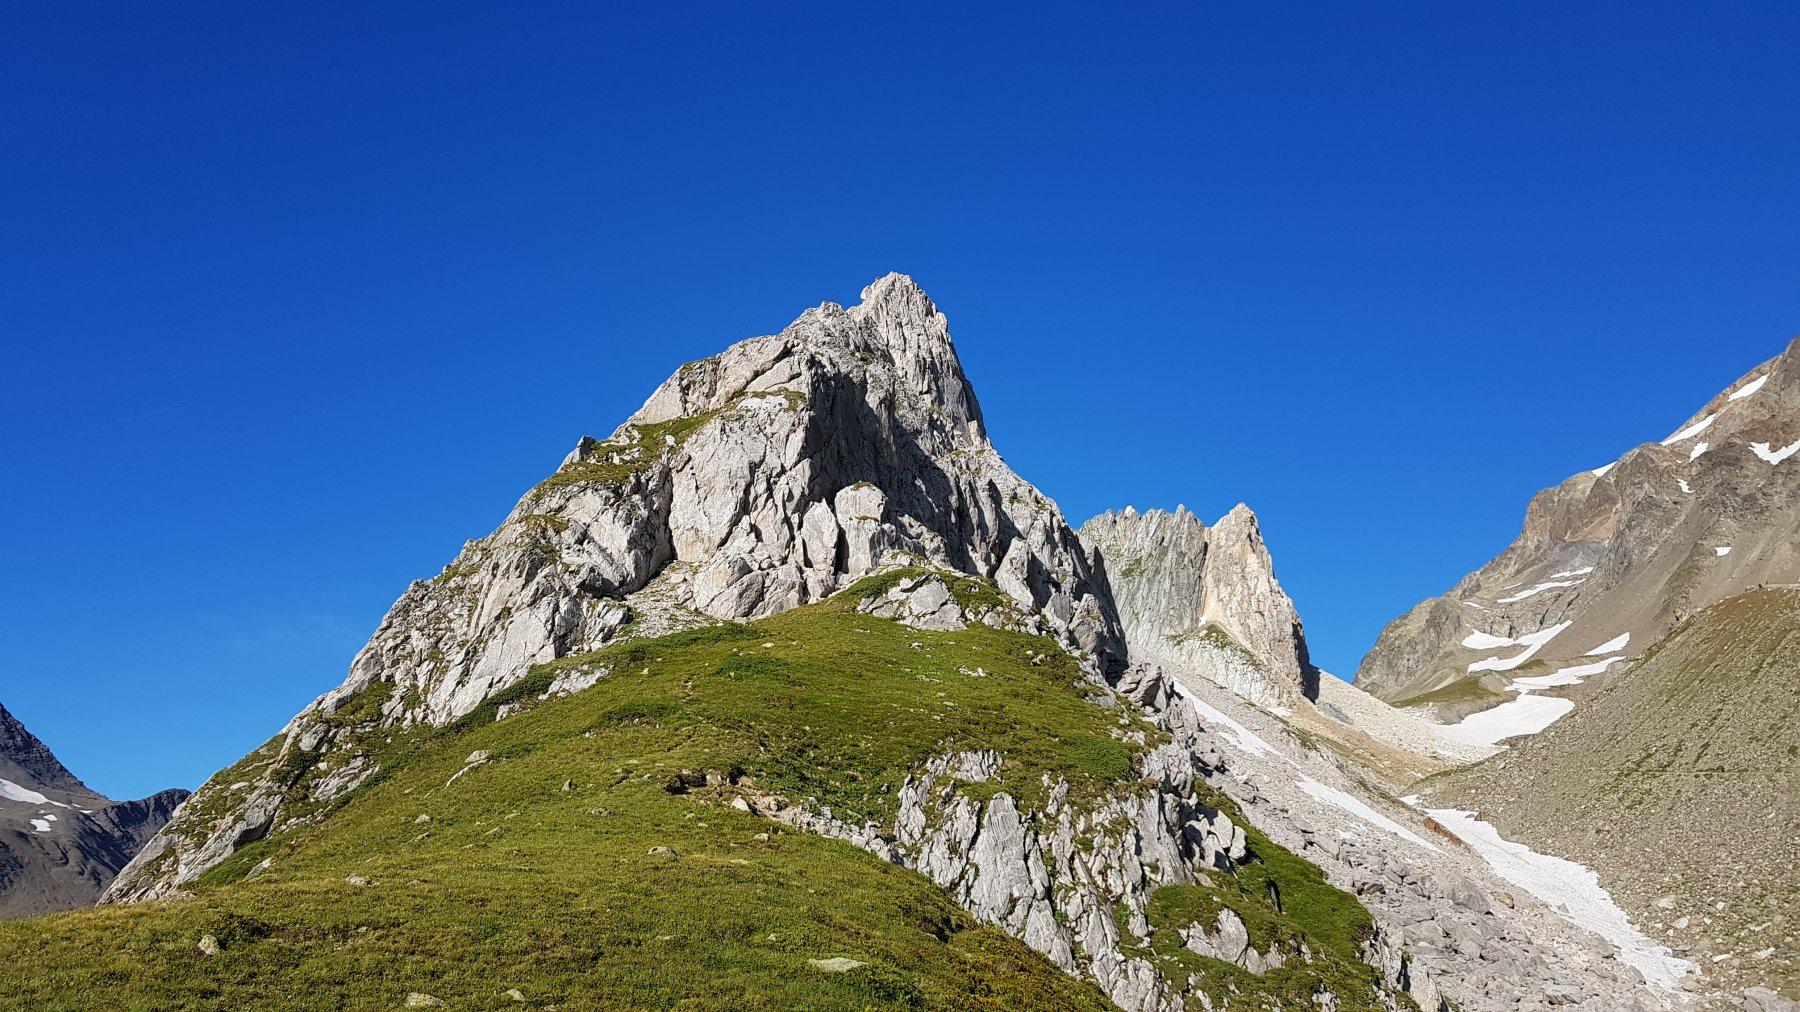 Pyramides Calcaires, cima SE Cresta NE 2019-08-04